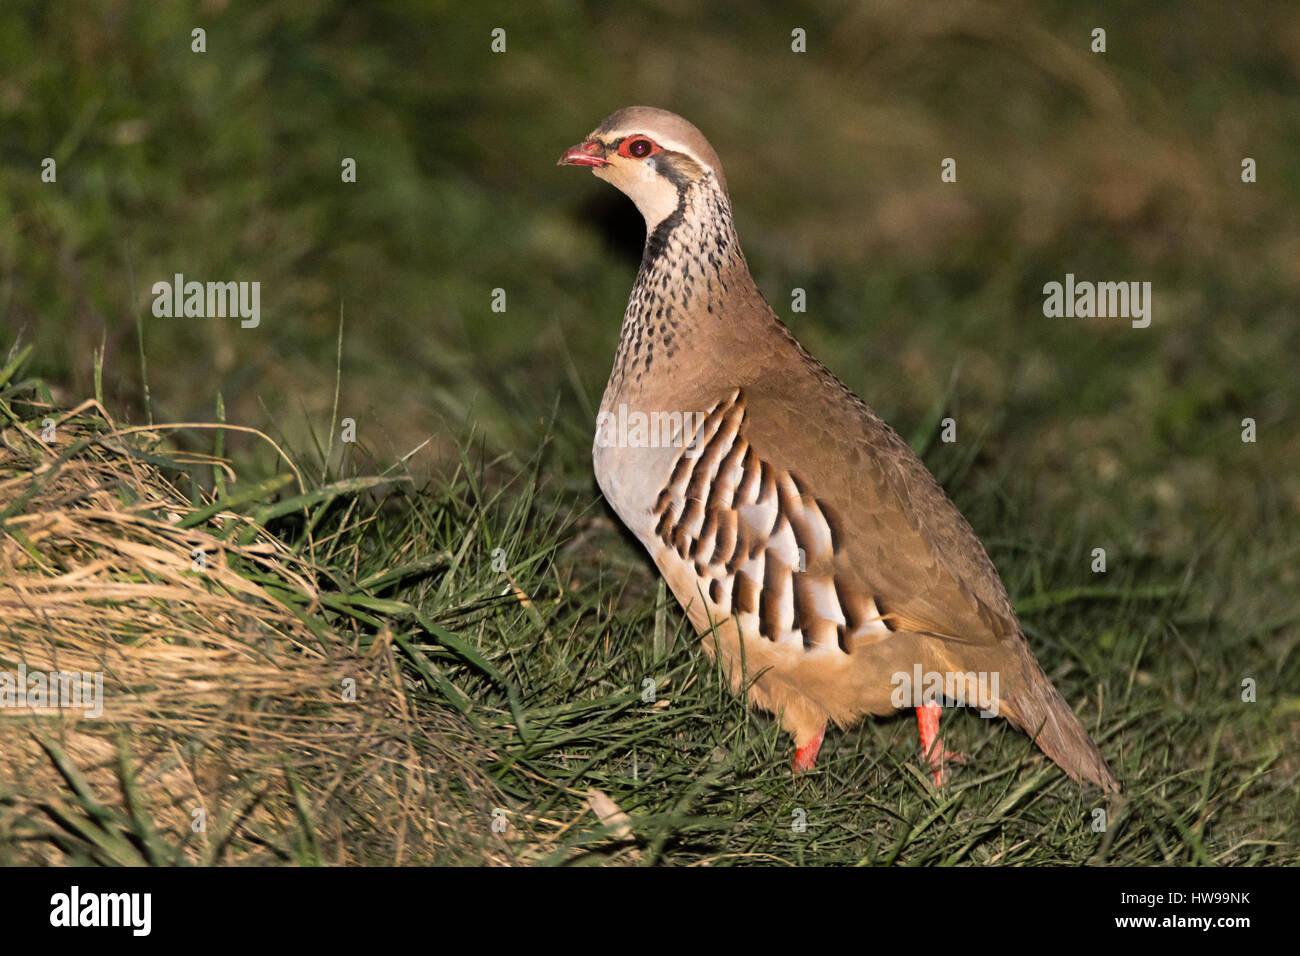 Red-legged partridge (Alectoris rufa). Gamebird in the pheasant family Phasianidae, aka French partridge, on grassland - Stock Image